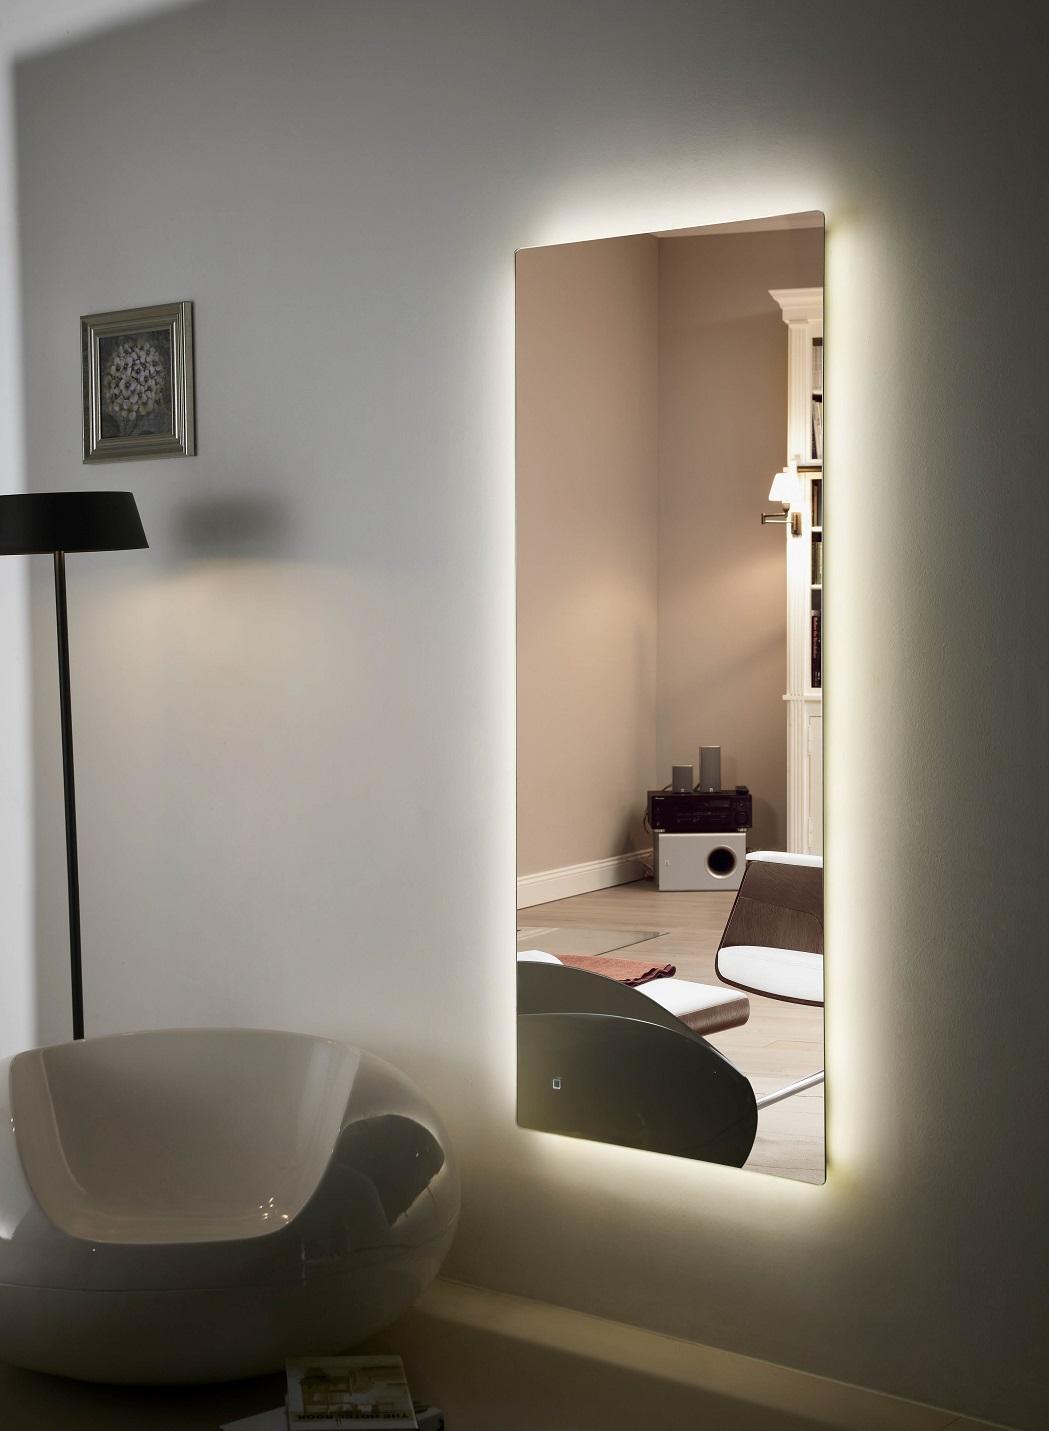 Backlit Bathroom Mirrors Usa Creative Decoration Including Regarding Large Illuminated Mirror (Image 3 of 20)